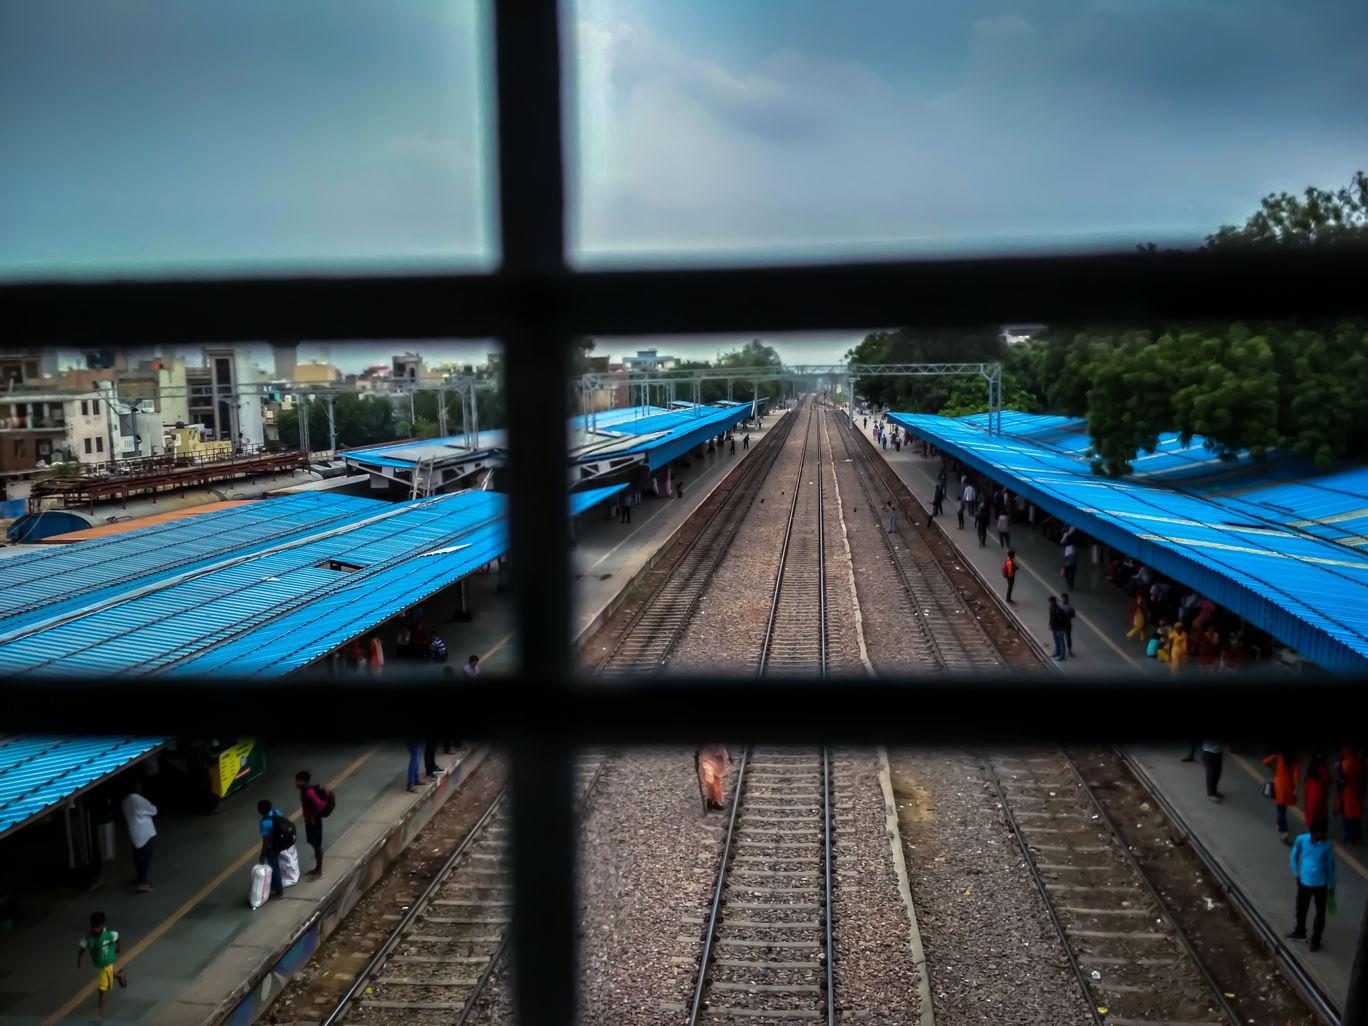 Photo of Gurgaon By Ankit Mahawar